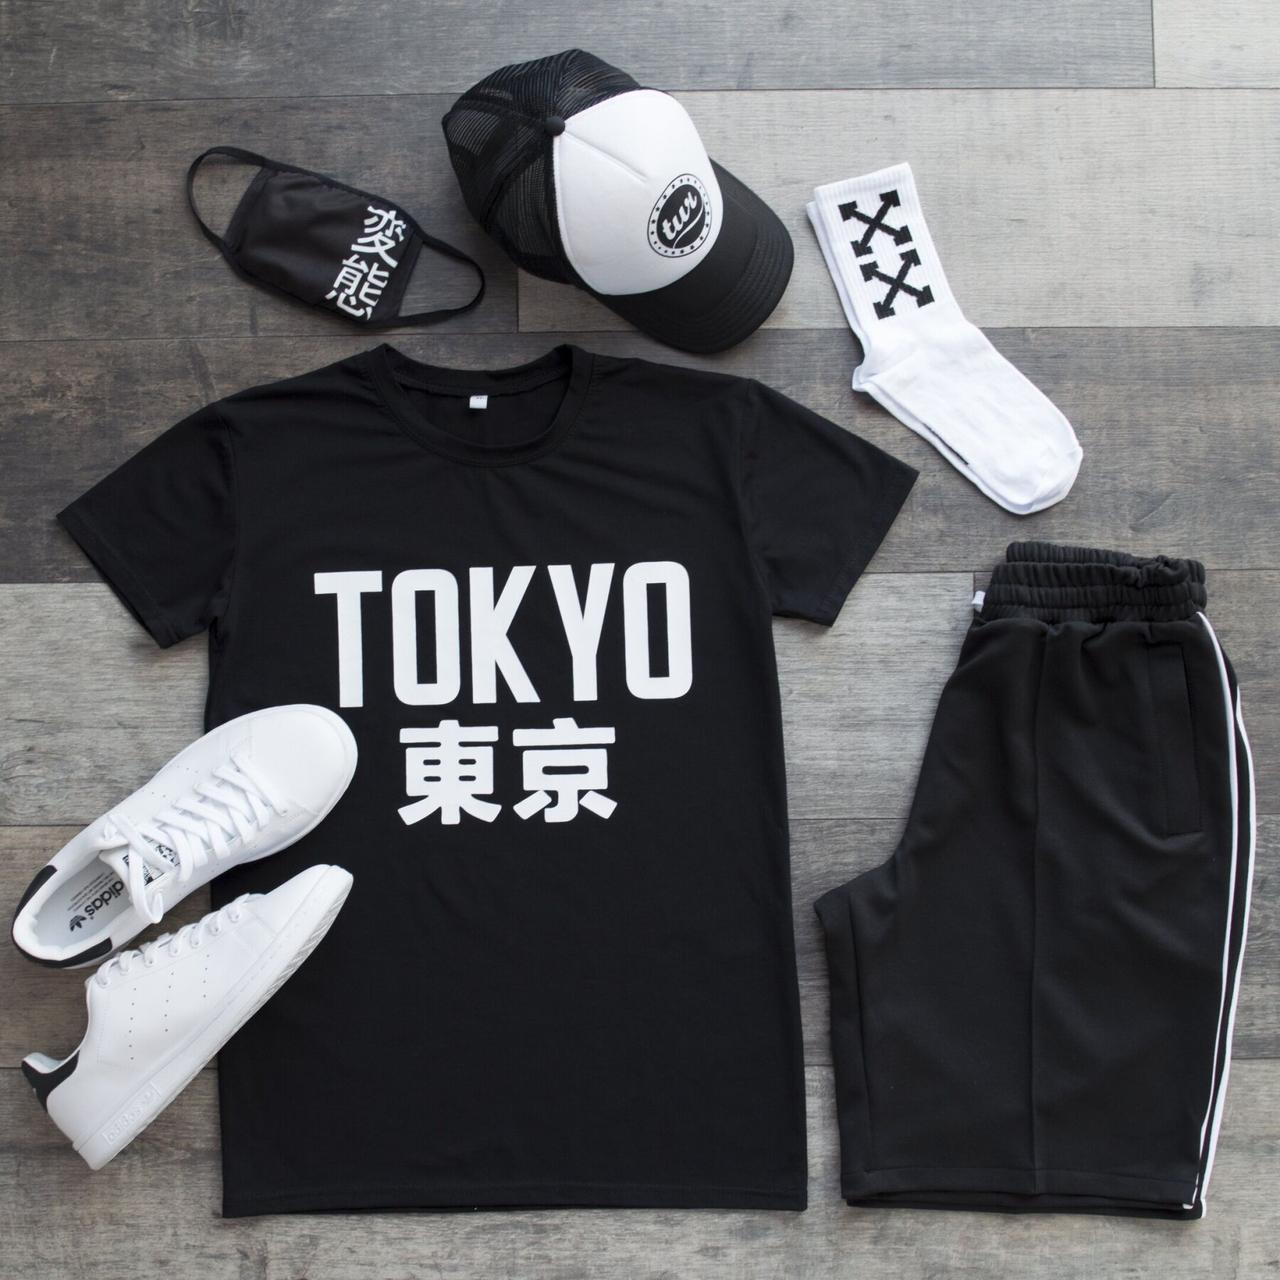 Летний комплект мужской Tokio  Футболка+шорты+кепка+маска+носки